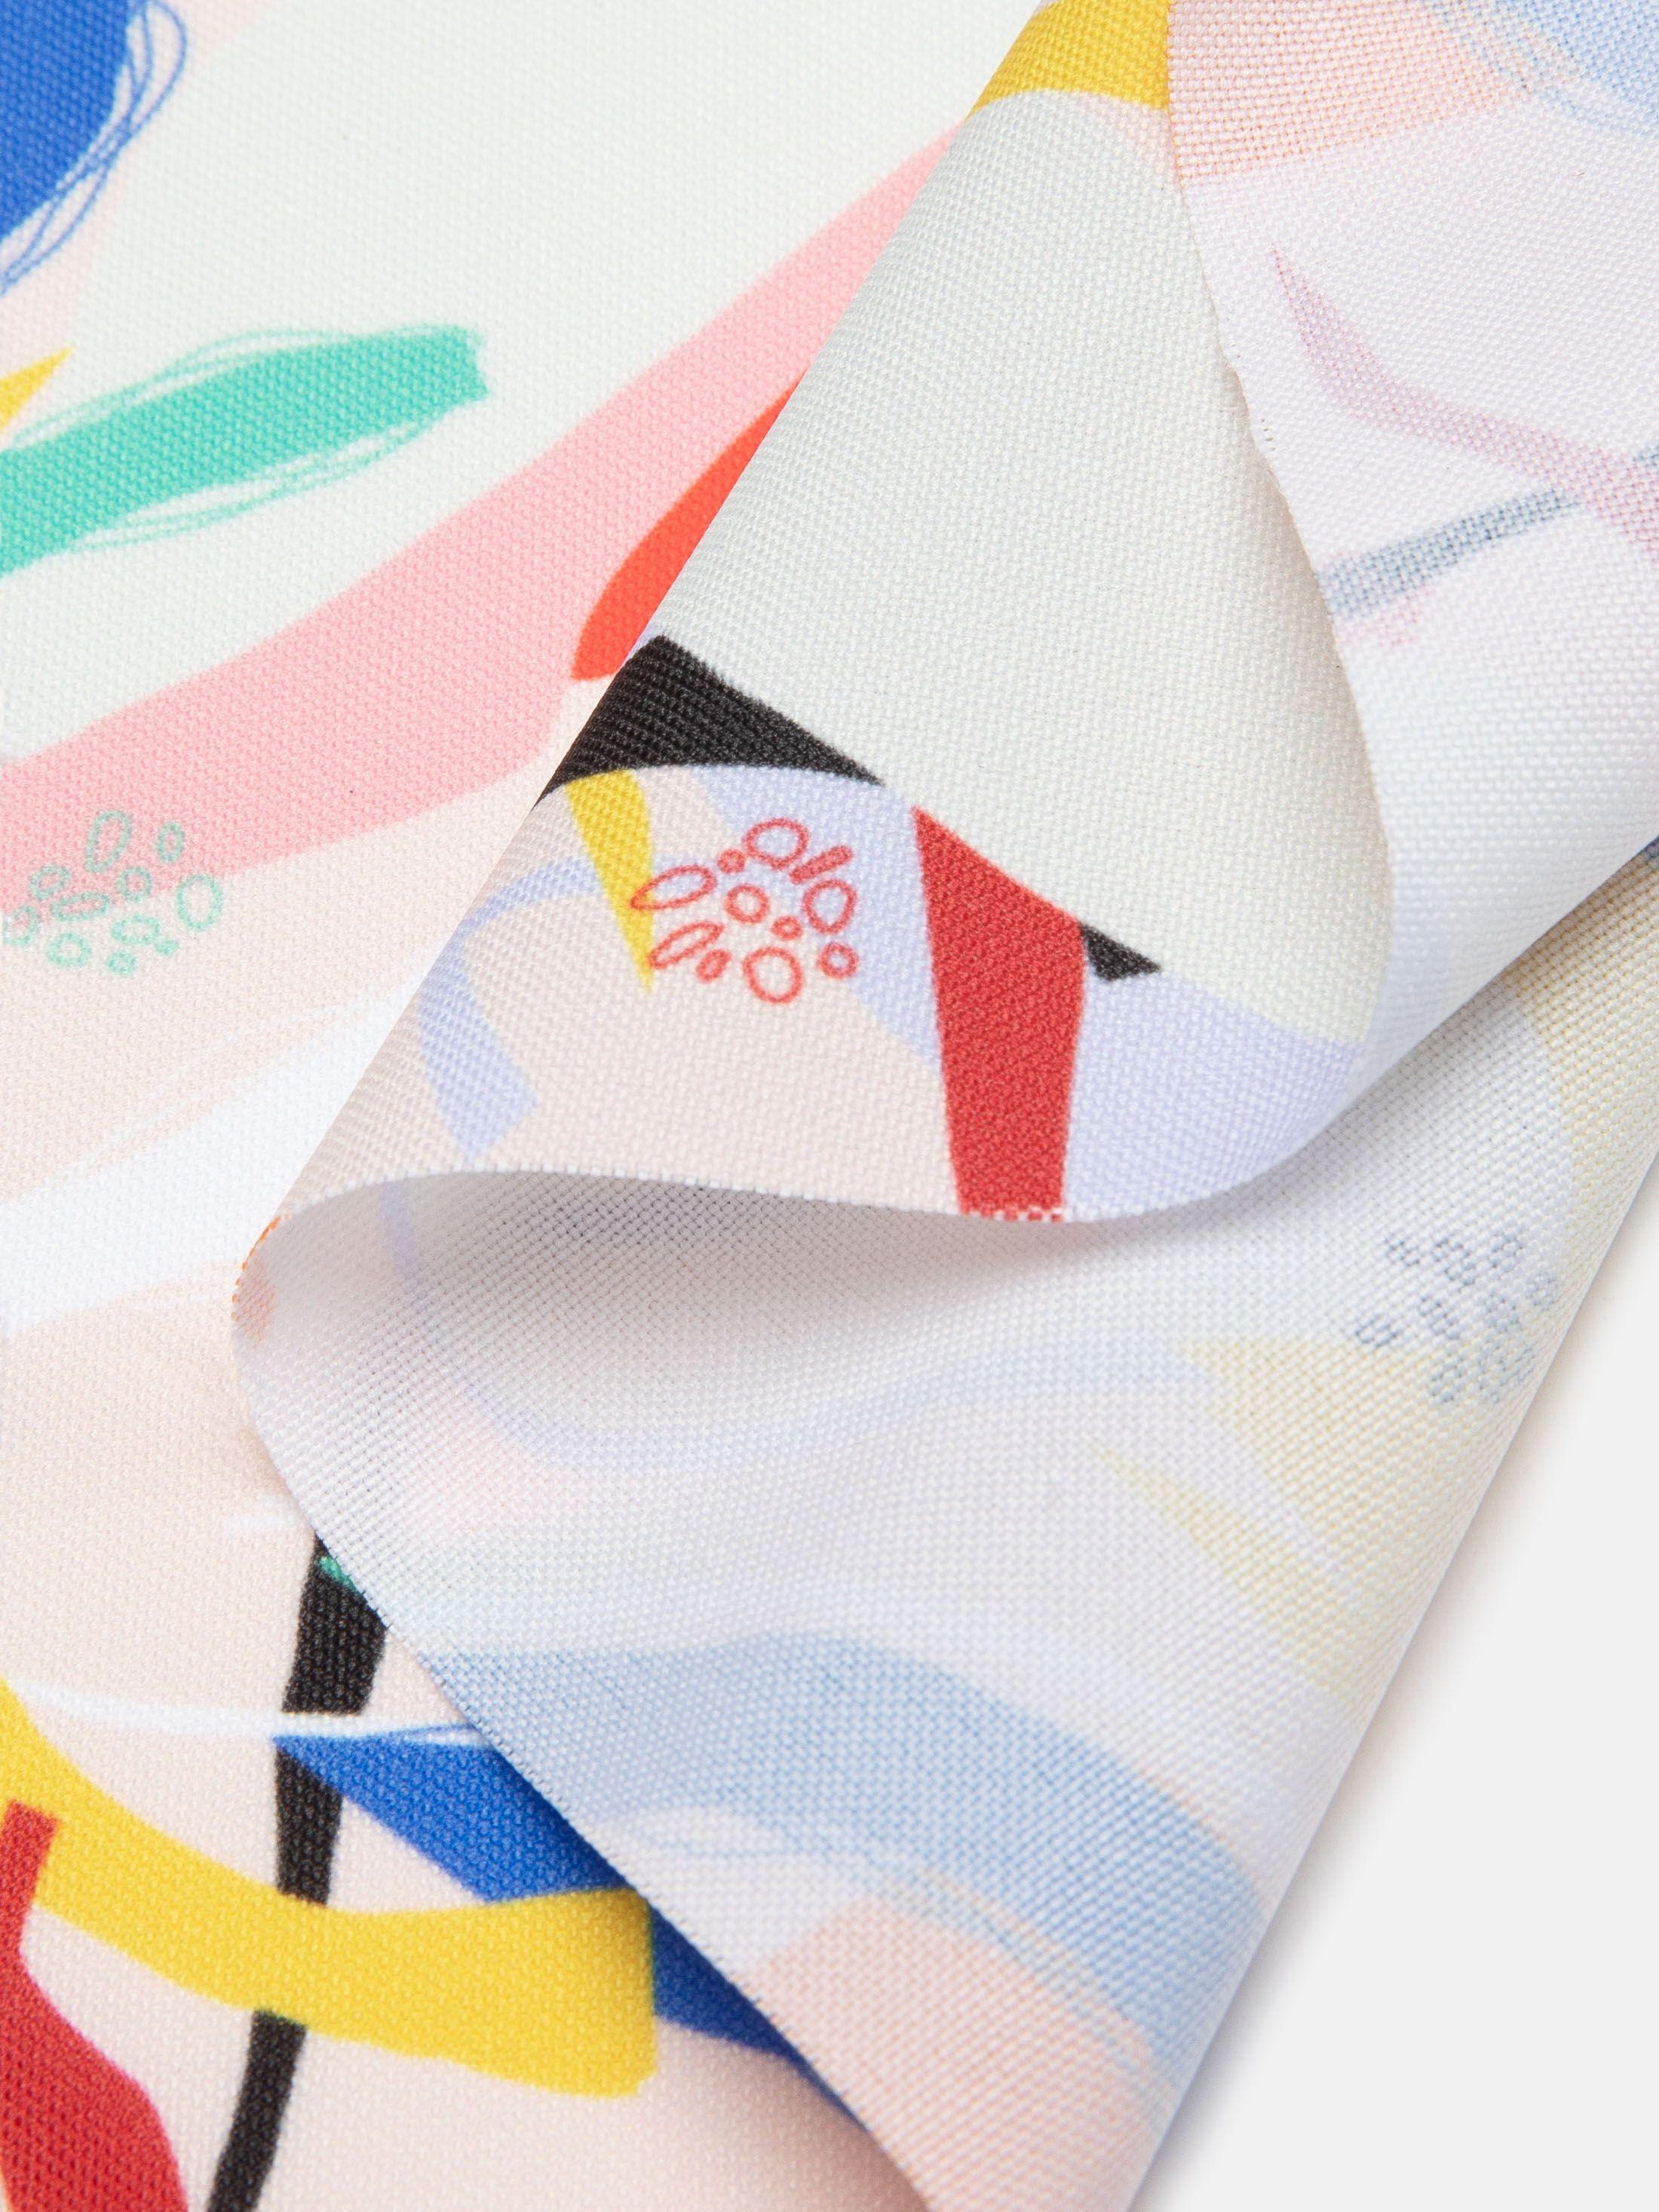 digital printing on Panama Flo fabric